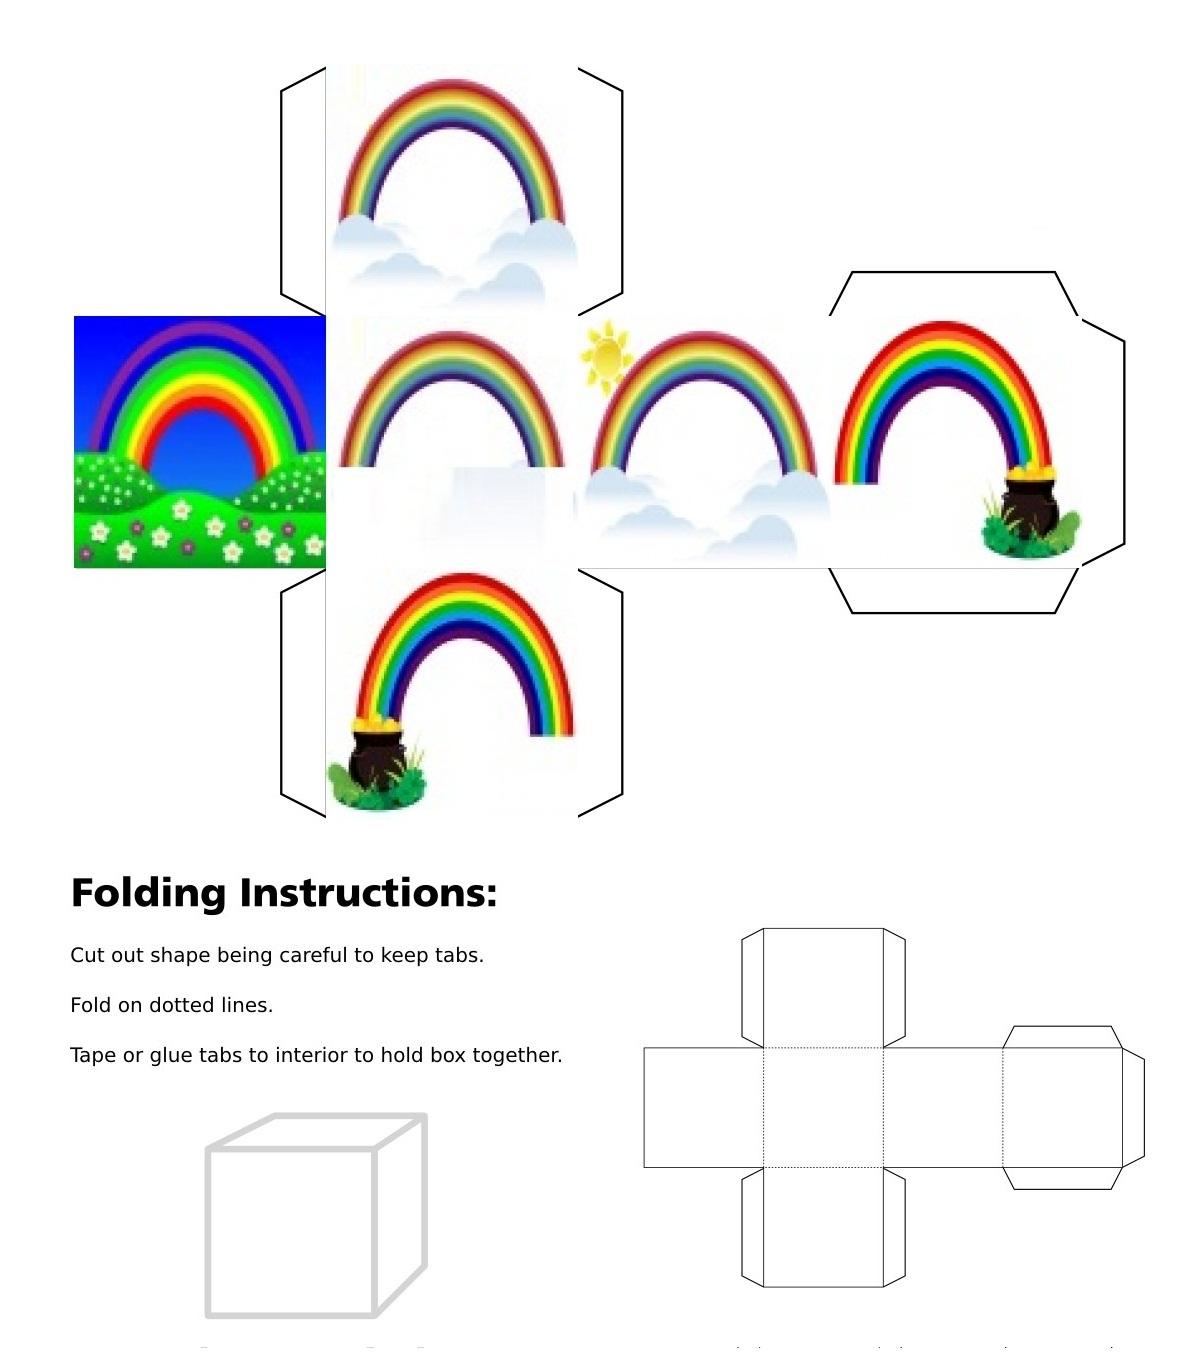 Rainbow over field, Rainbow and two clouds cube, Rainbow alone, Rainbow with pot on the left, Rainbow with pot on the right, Rainbow and two clouds and sun, 3Dcube, dice, dice, Good Luck